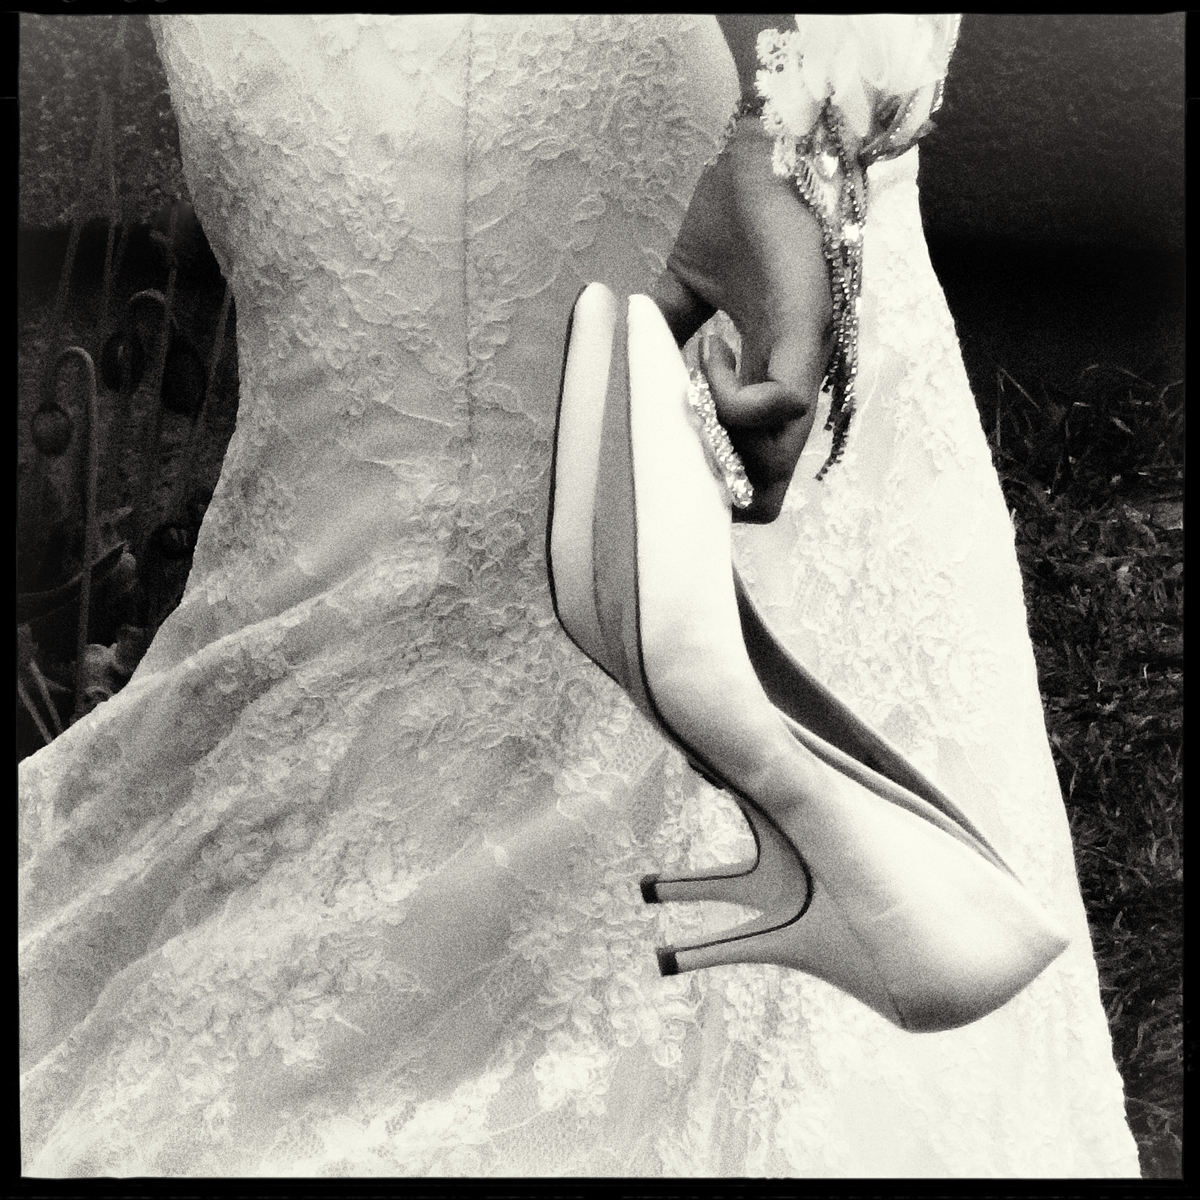 masks business - photography, blackandwhitephotography - danhayon | ello